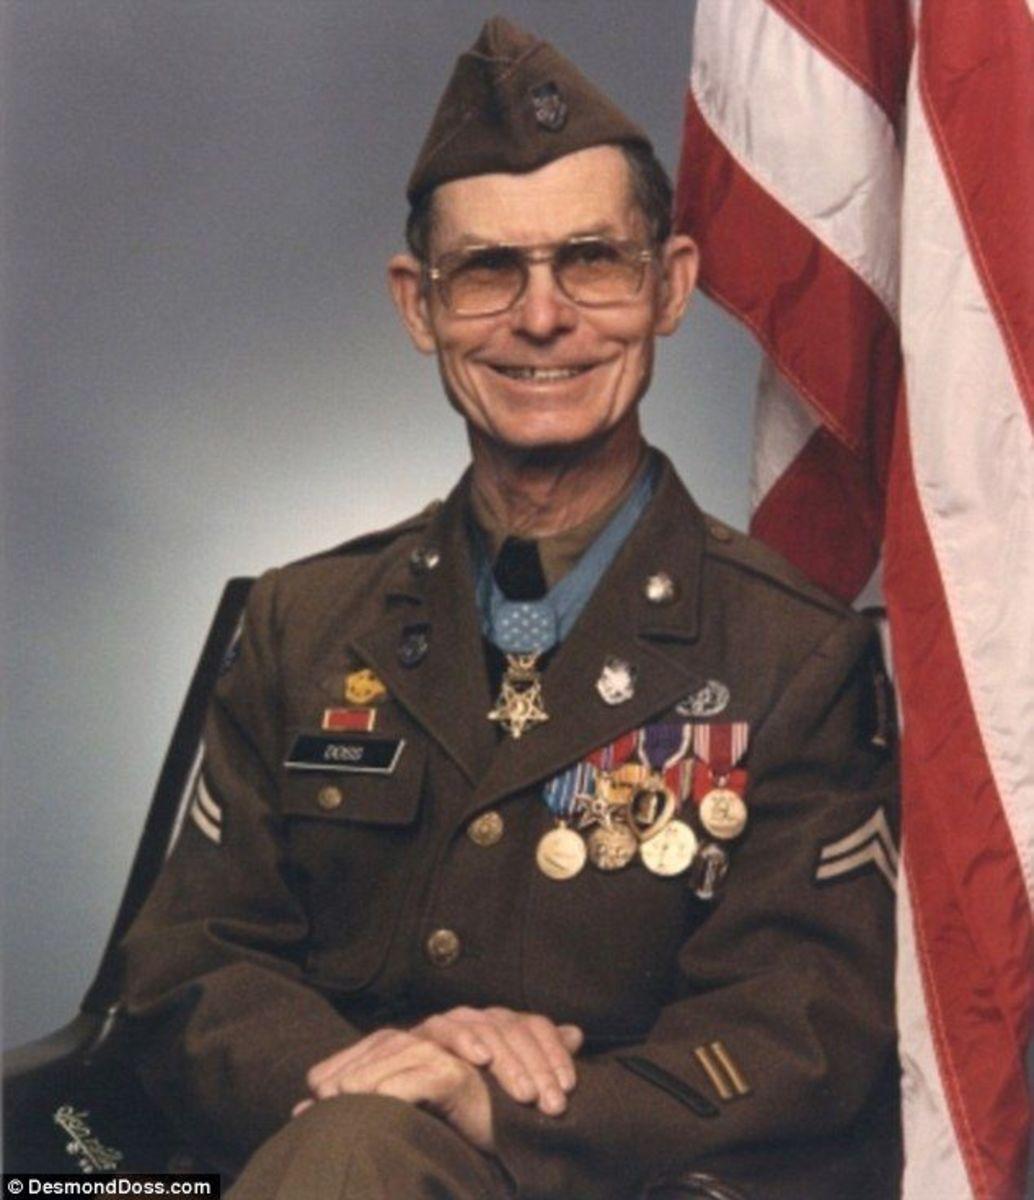 Desmond Doss with medals